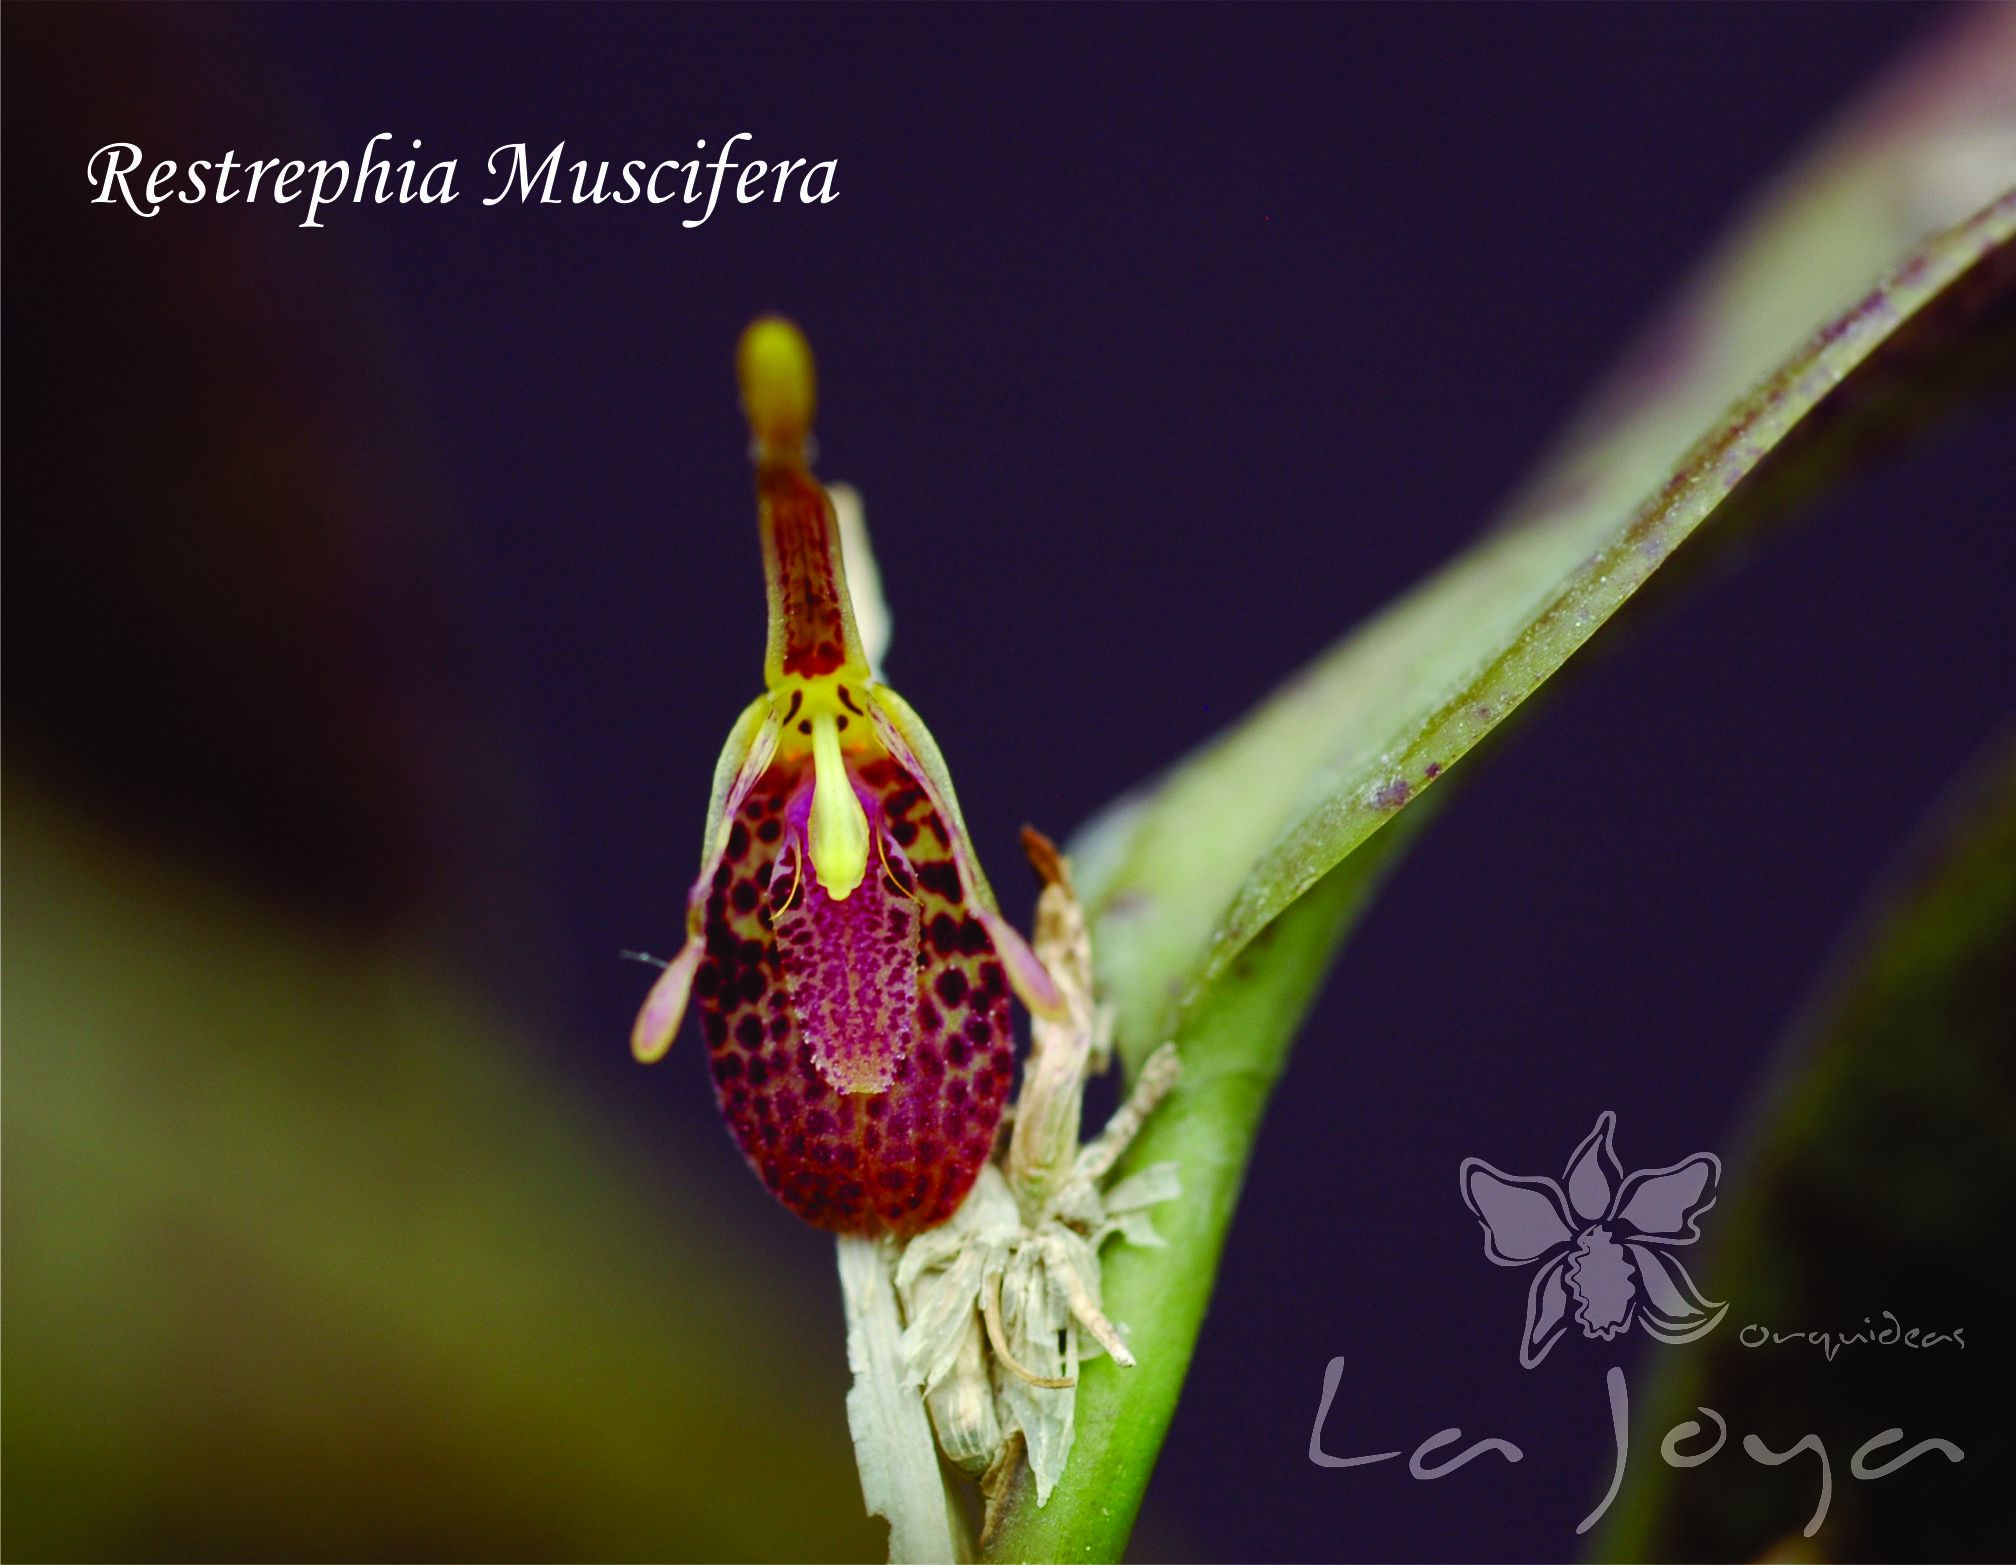 Restrephia Mucisfera